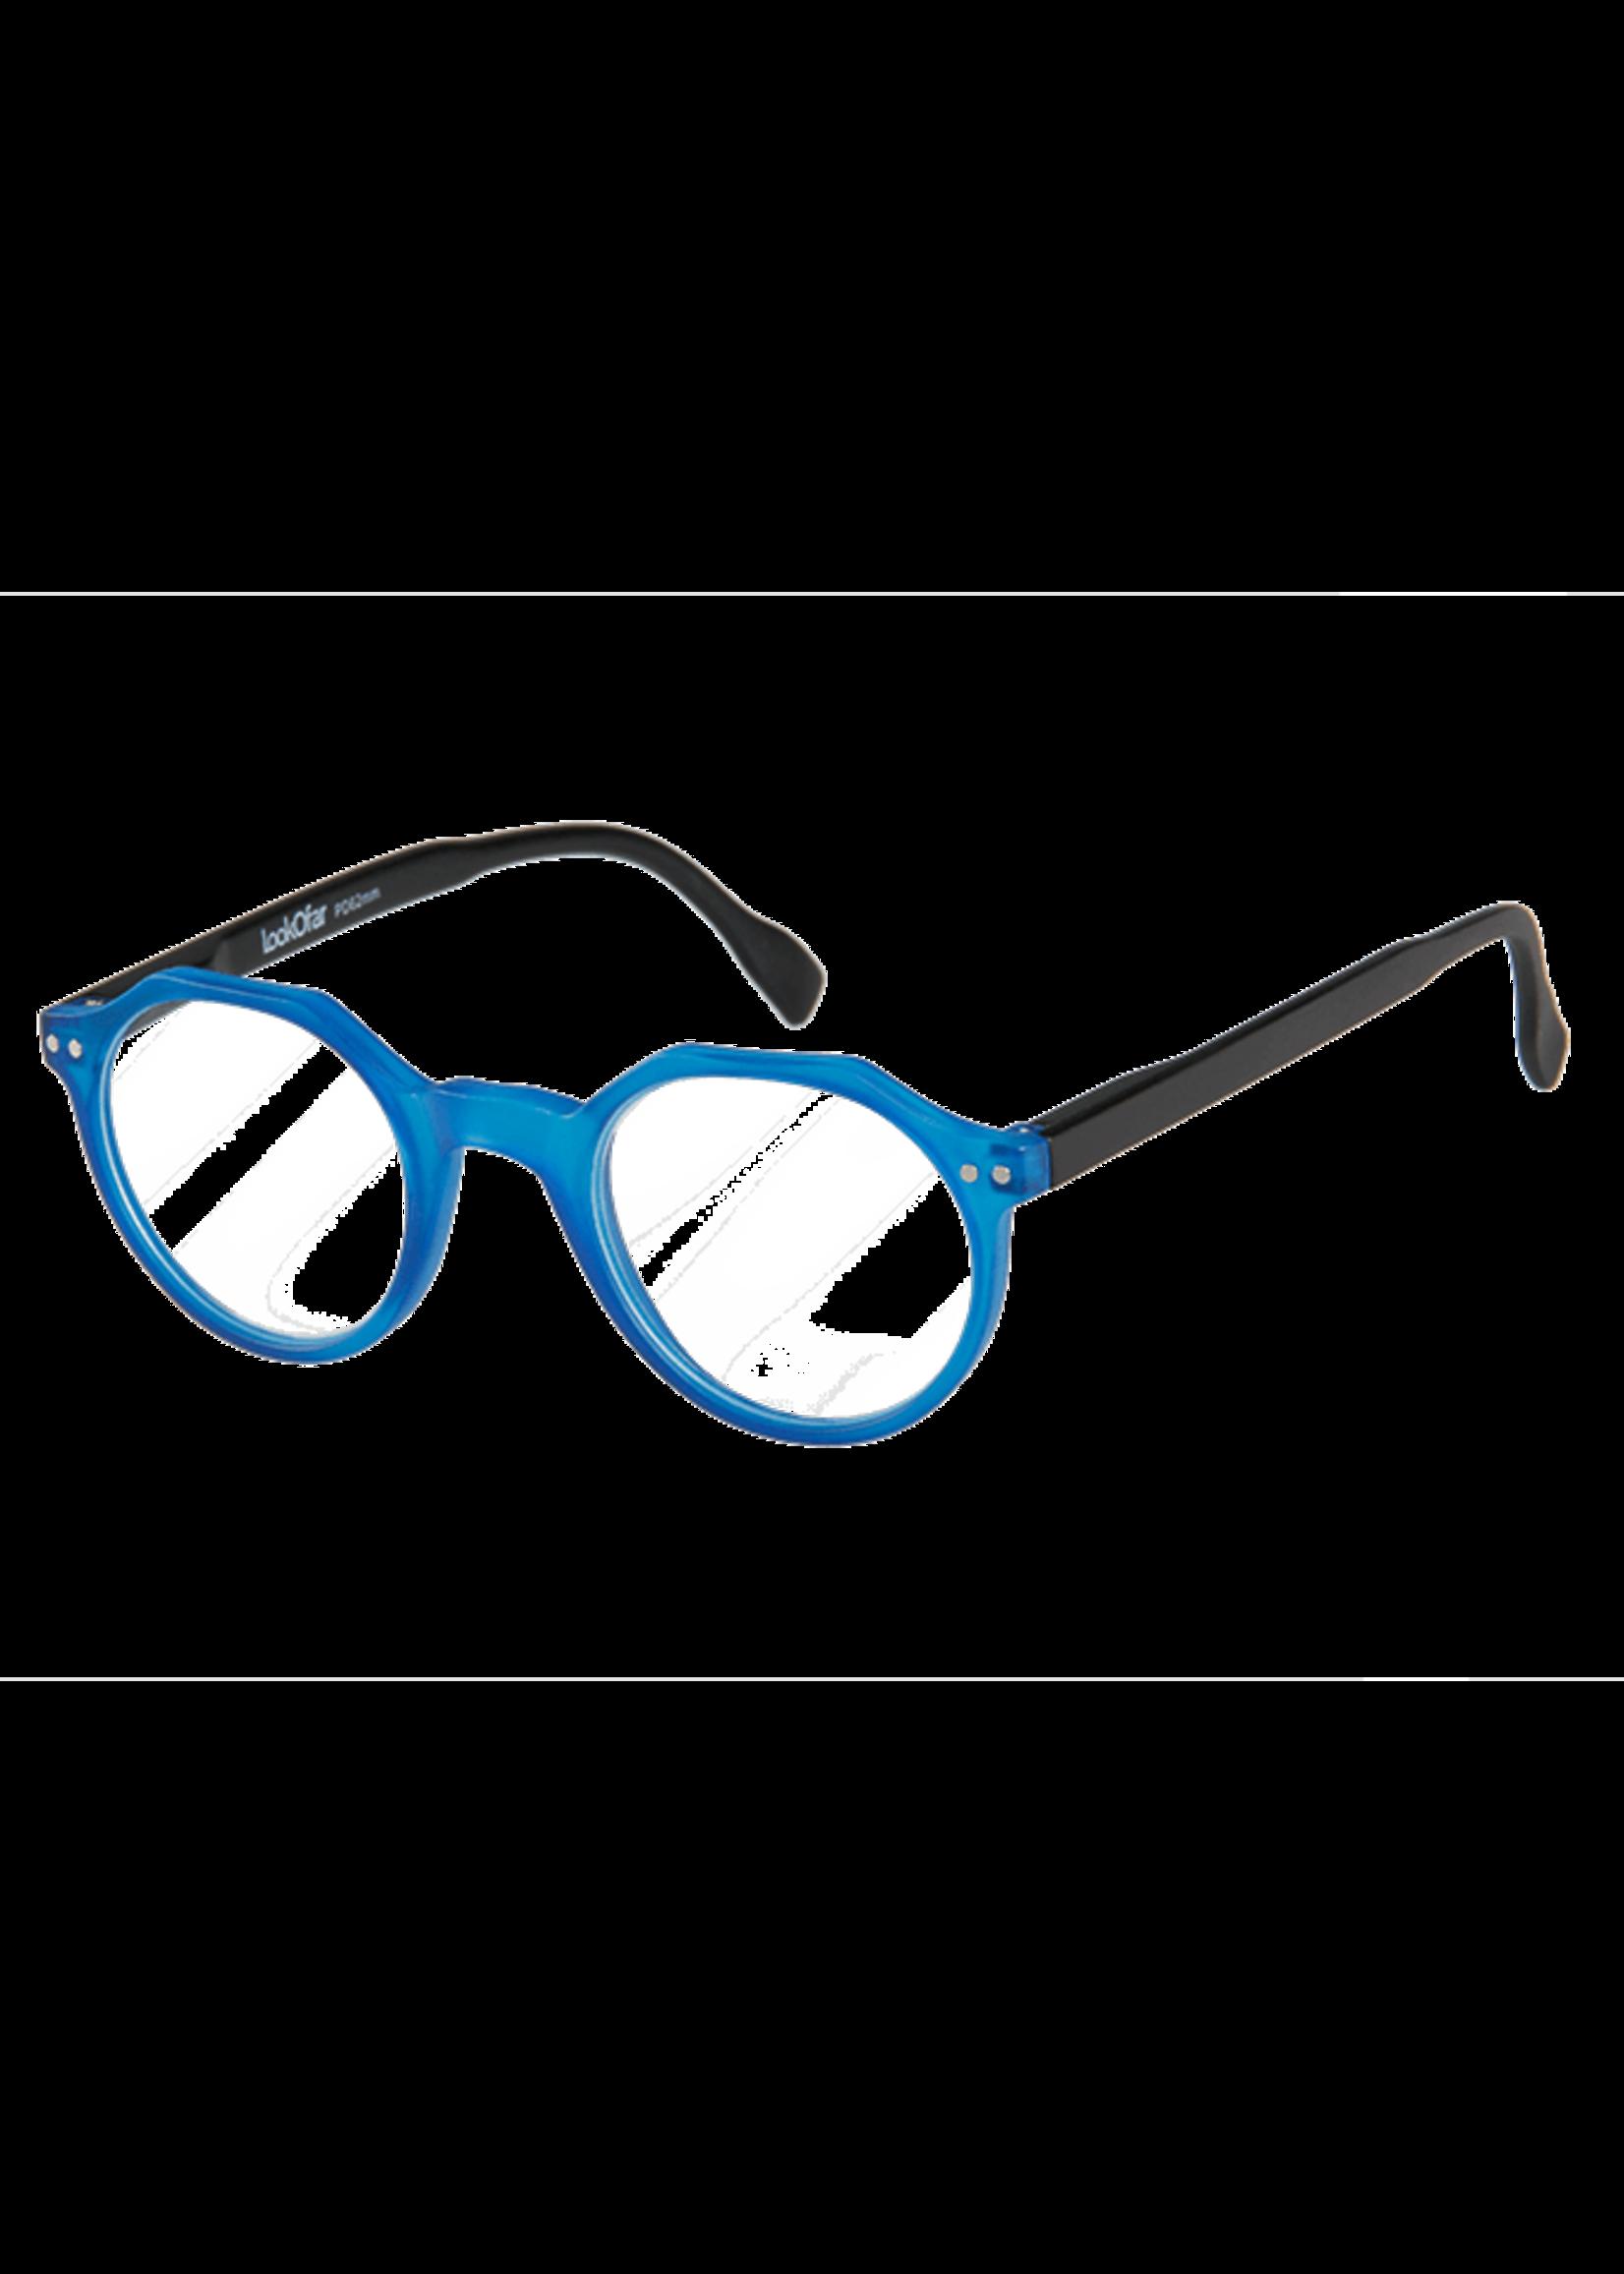 Ofar Leesbril model Harvard Bleu LE 0195 Combi